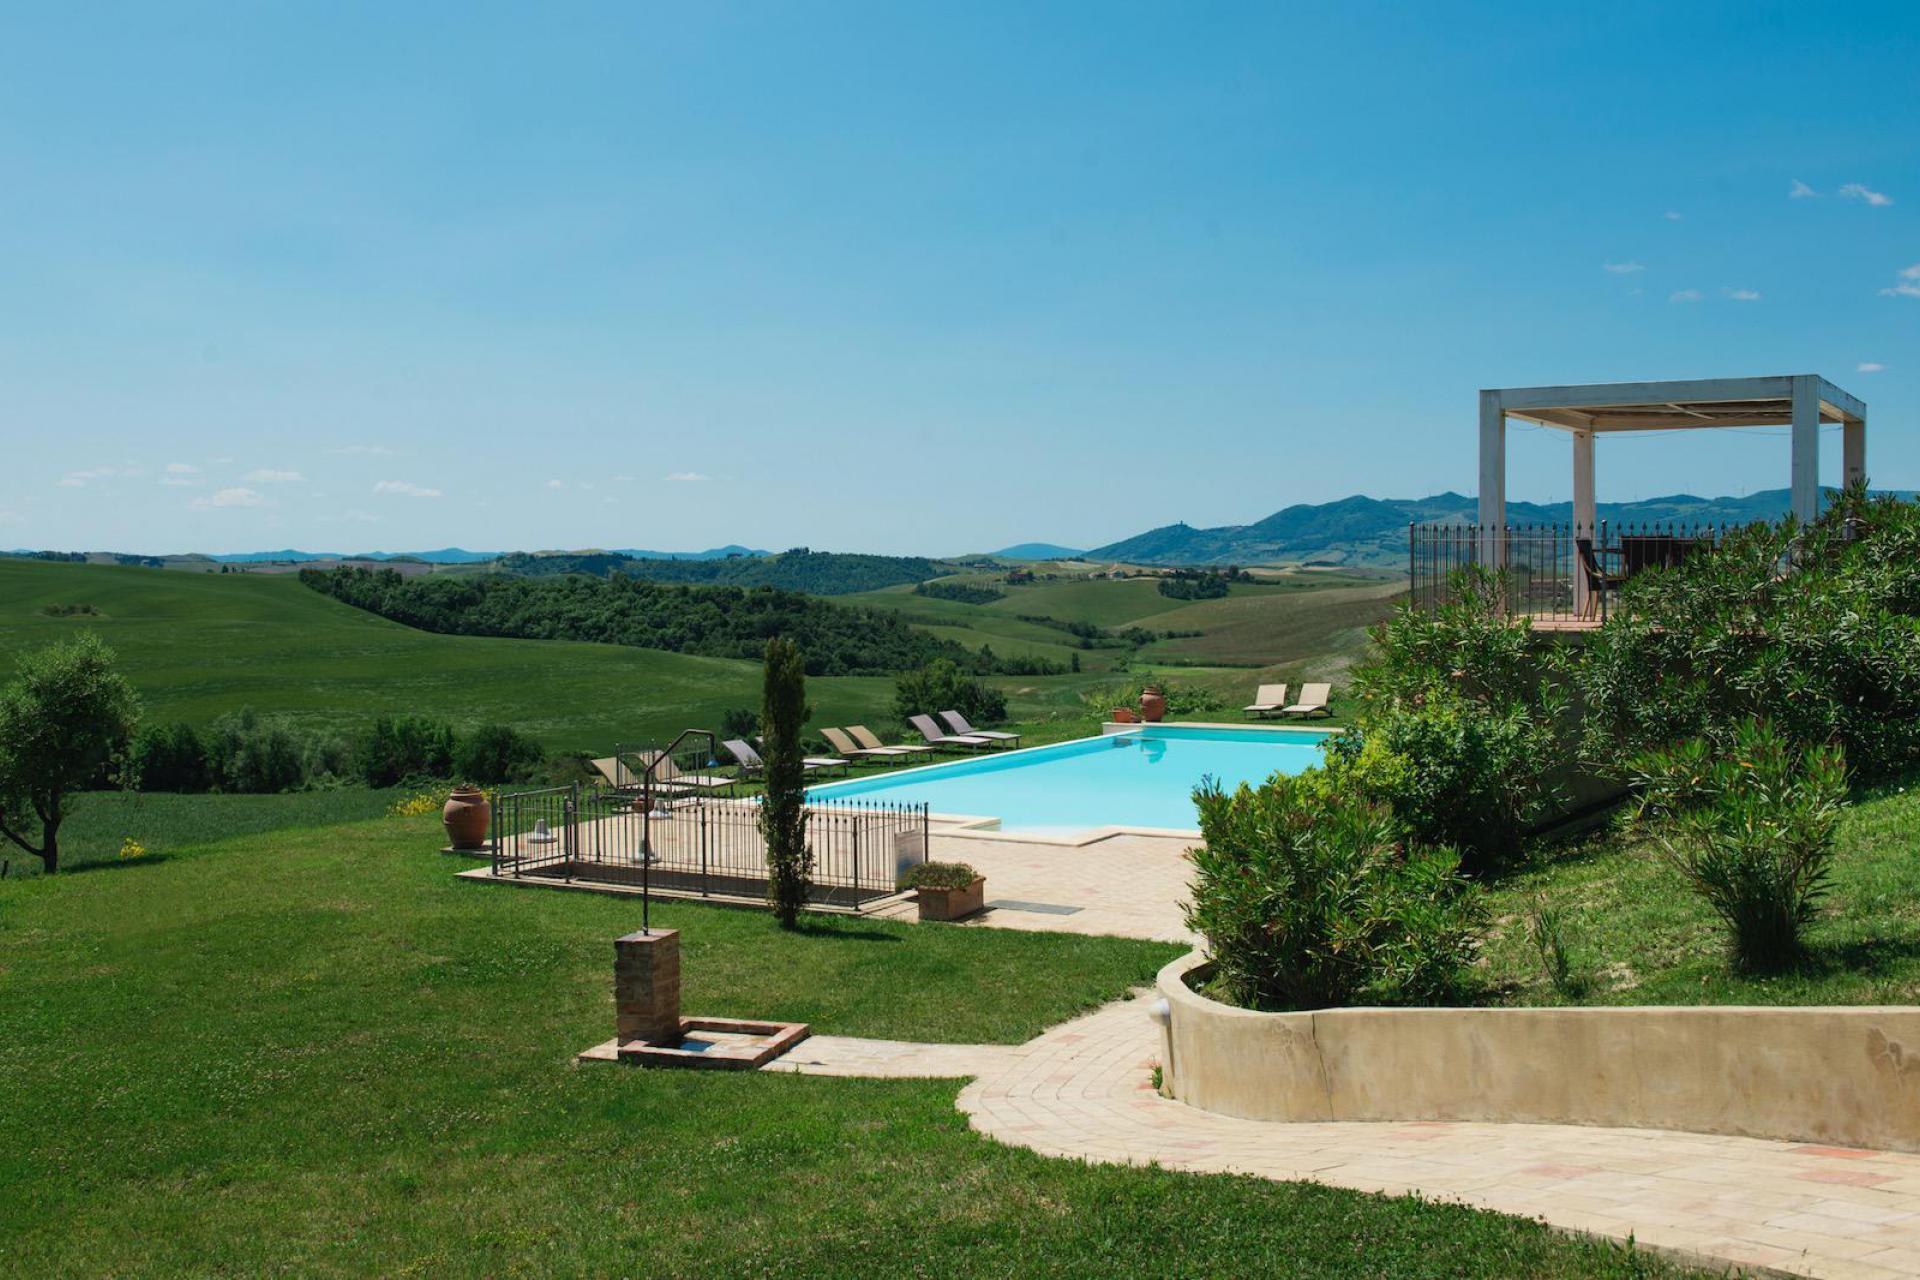 Agriturismo Toskana Agriturismo Toskana mit Pool und Panoramablick